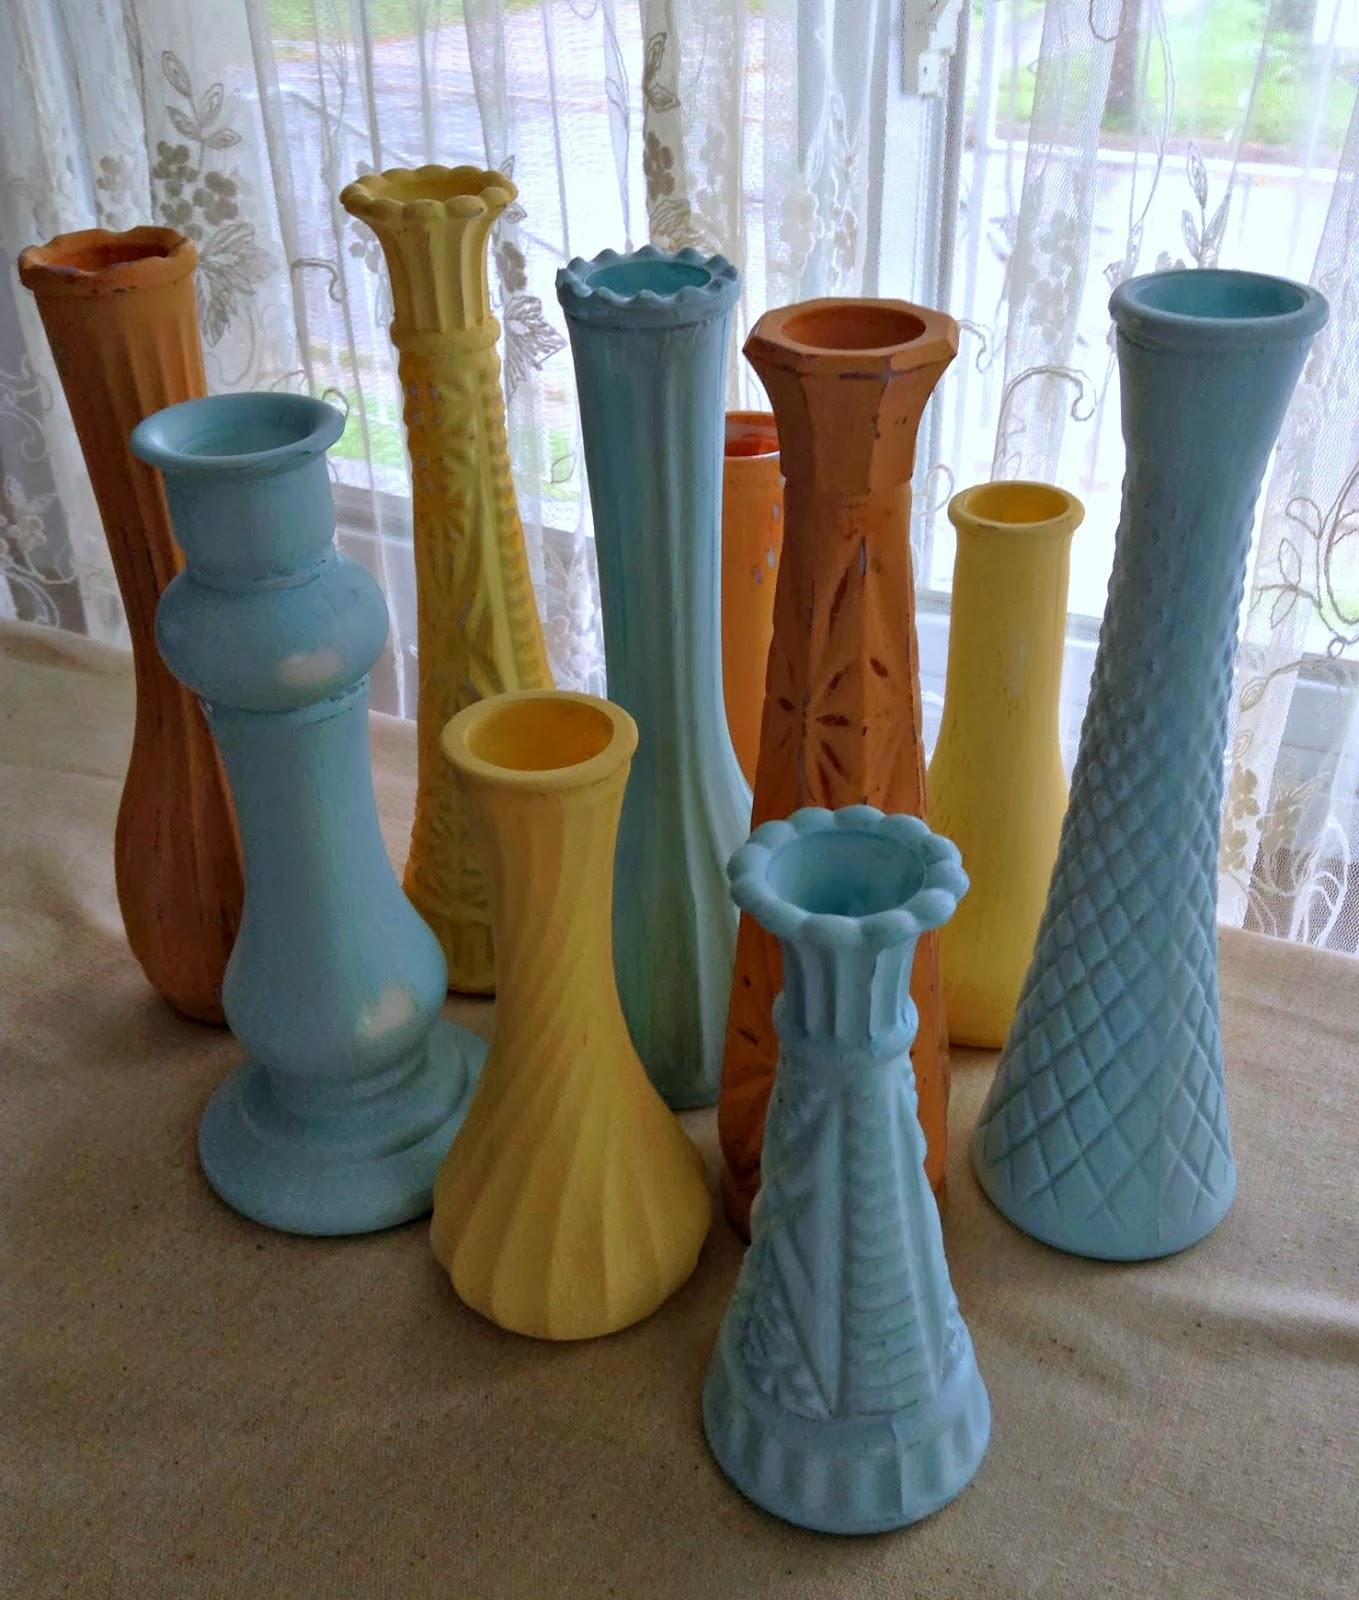 Diy autumn pastel painted vases pastel autumn painted vases how to simply paint old vases to give them new life reviewsmspy